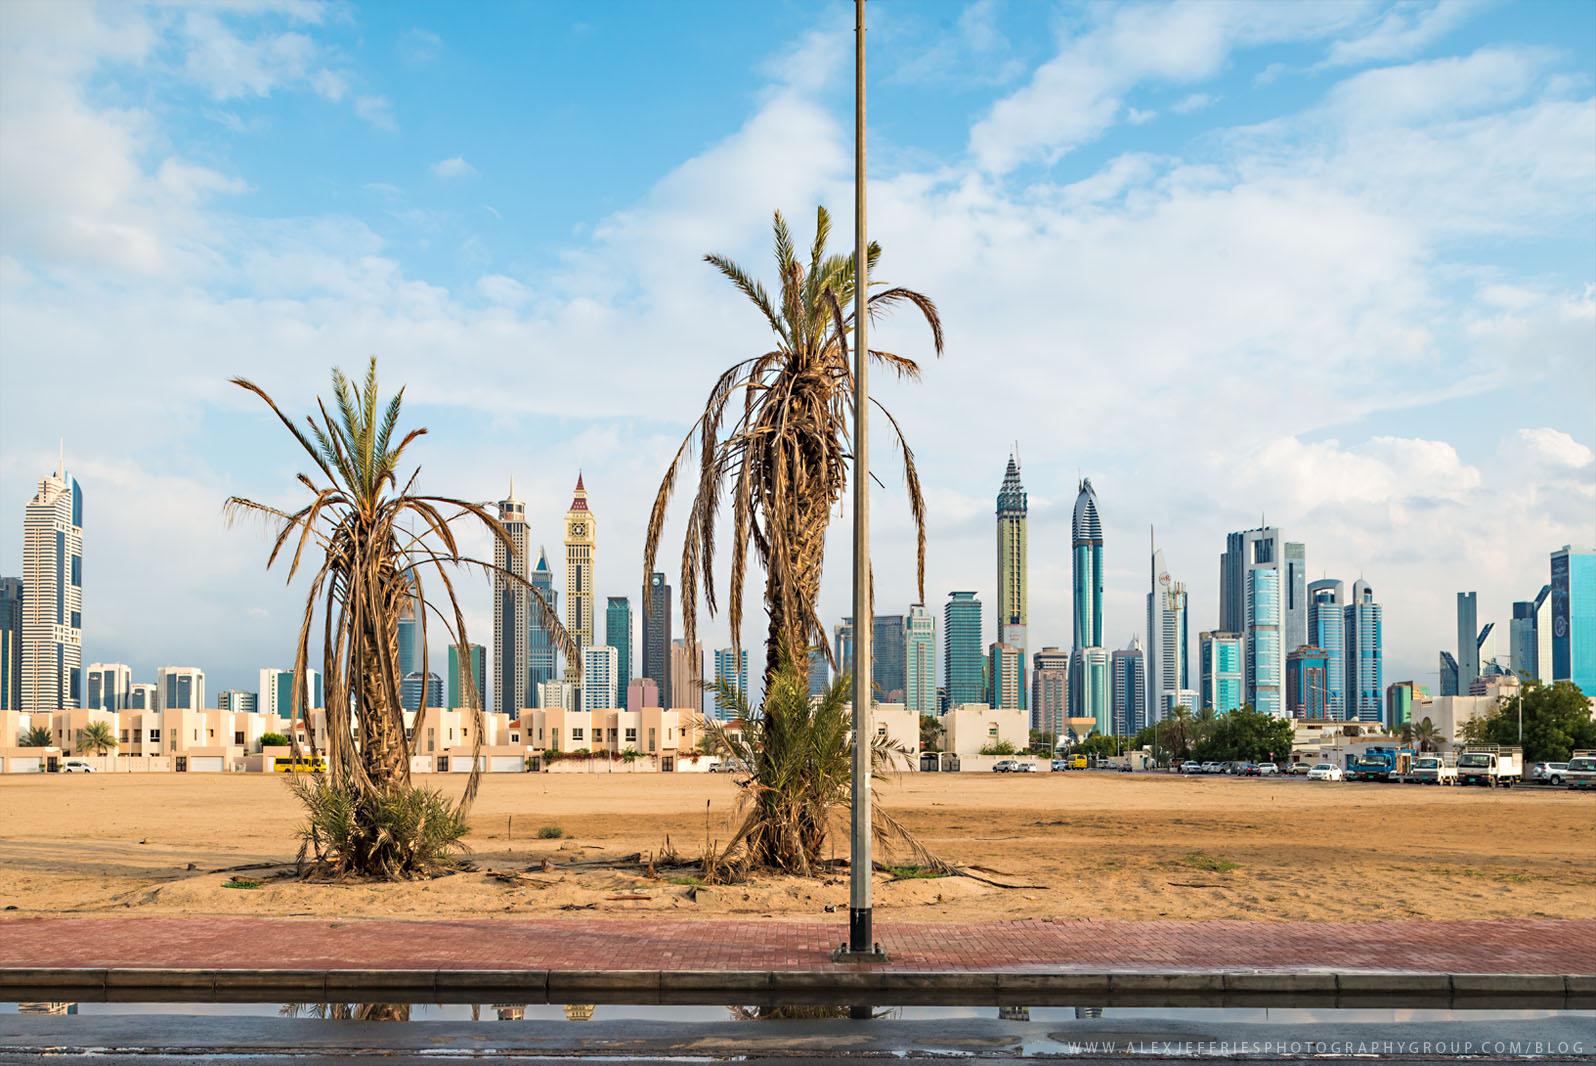 Dubai after the rain